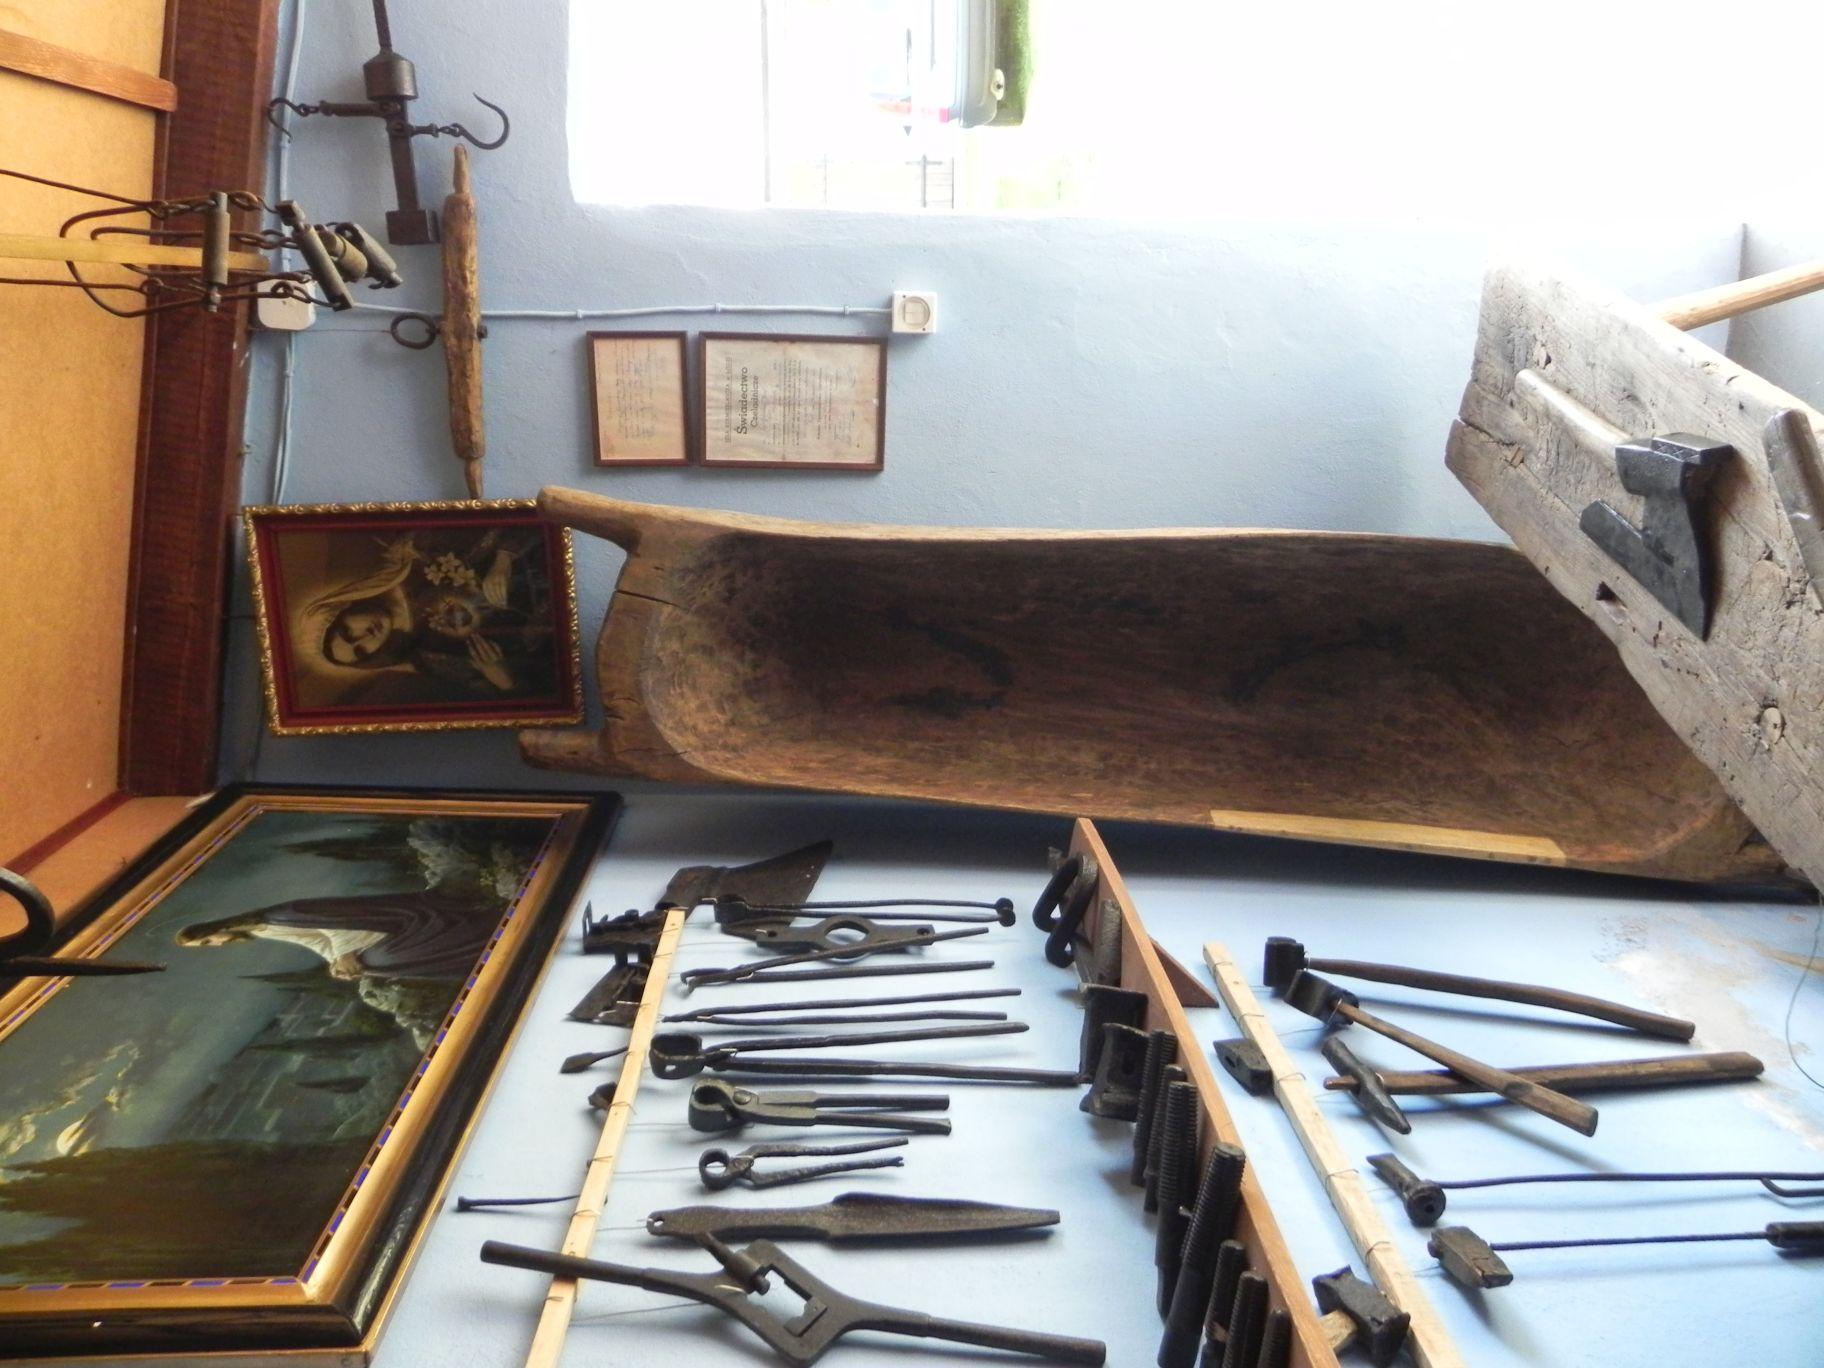 2012-05-03 Lipce Reymontowskie - galeria staroci (29)